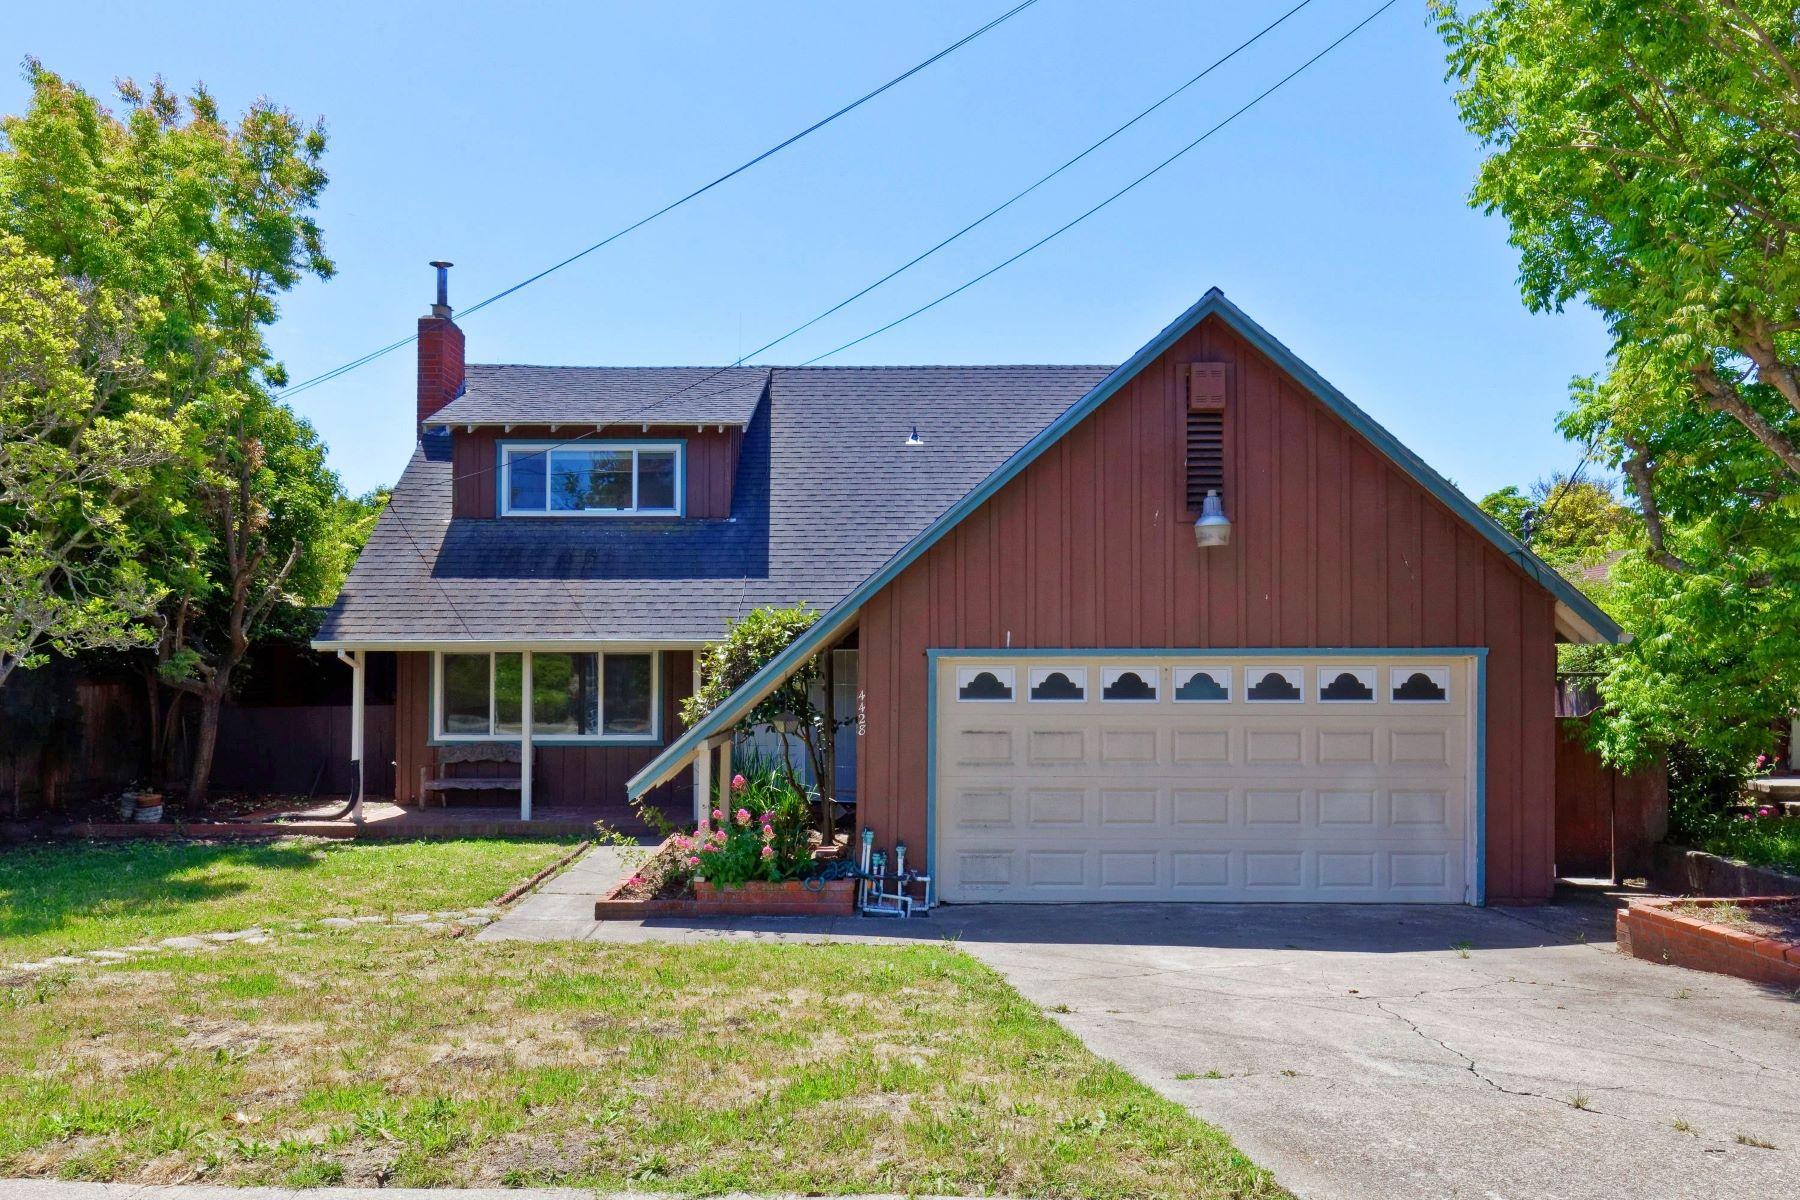 Single Family Homes for Active at Modern And Traditional Elements 4428 Santa Rita Road Richmond, California 94803 United States